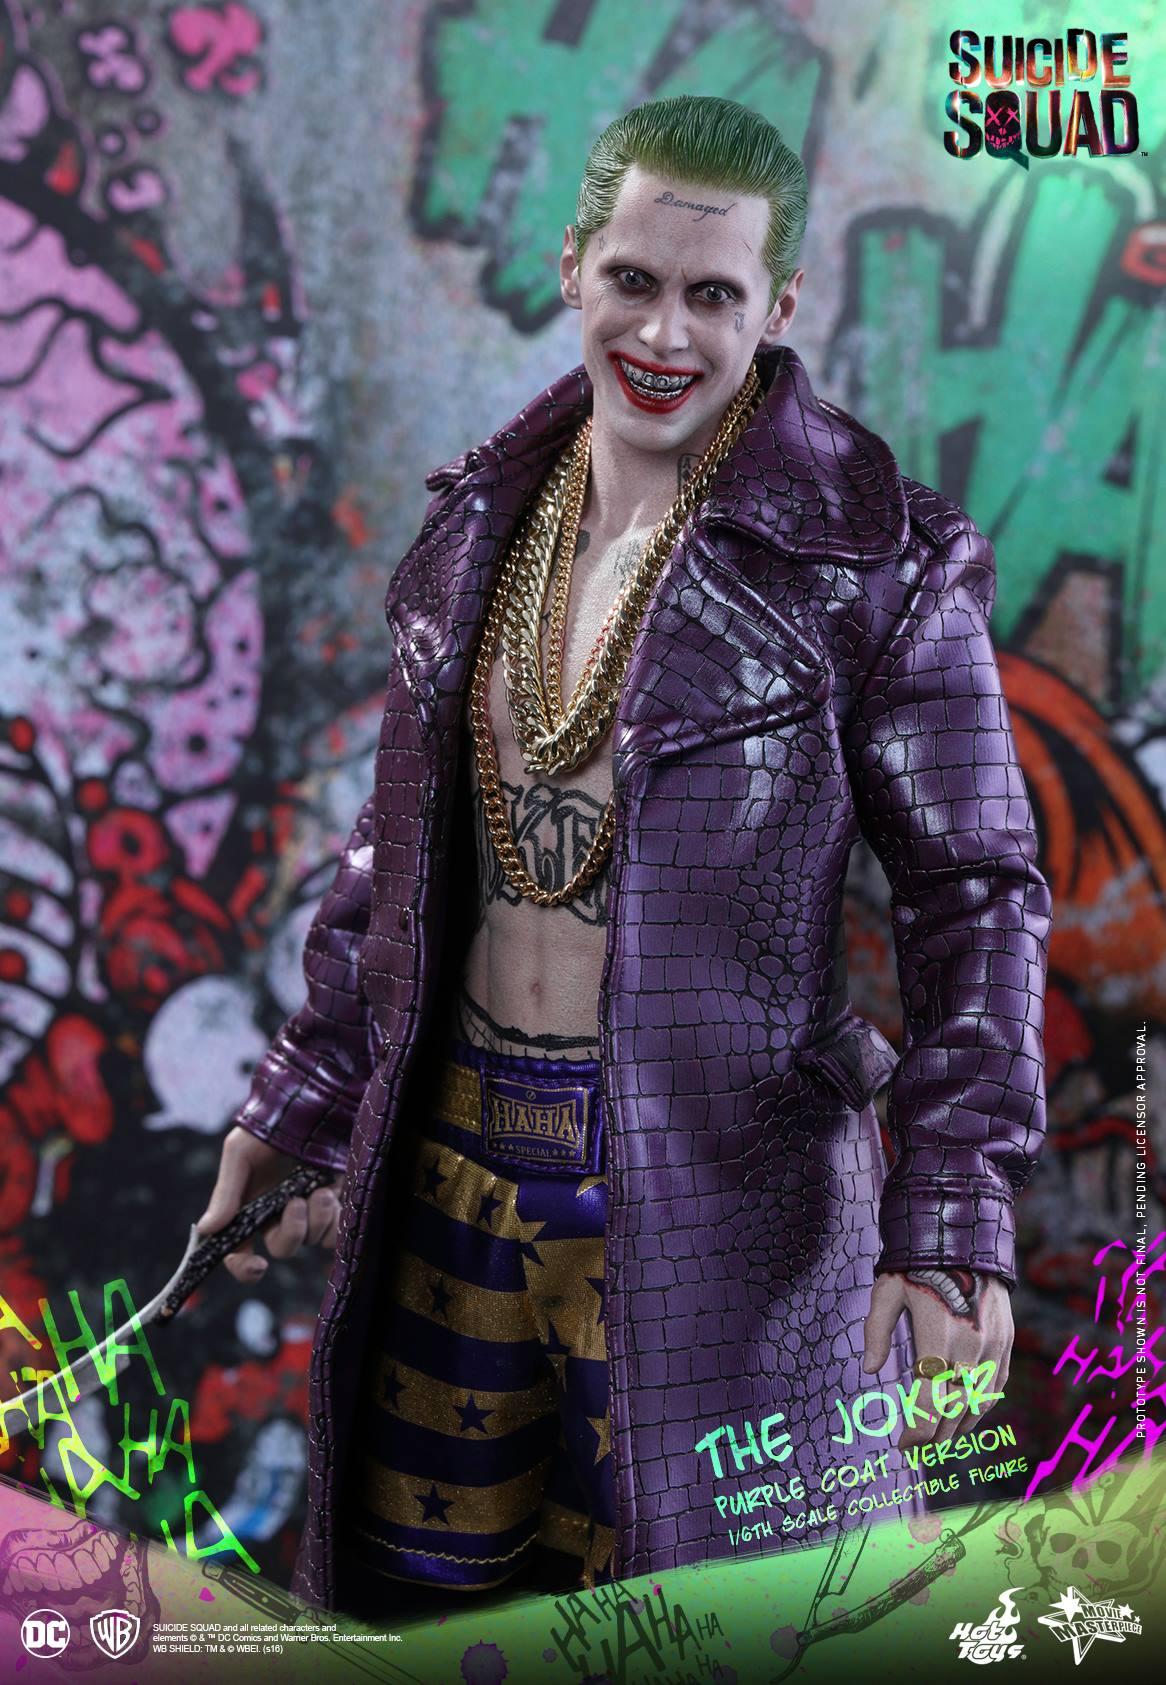 Hot-Toys-Suicide-Squad-Joker-Purple-Coat-11